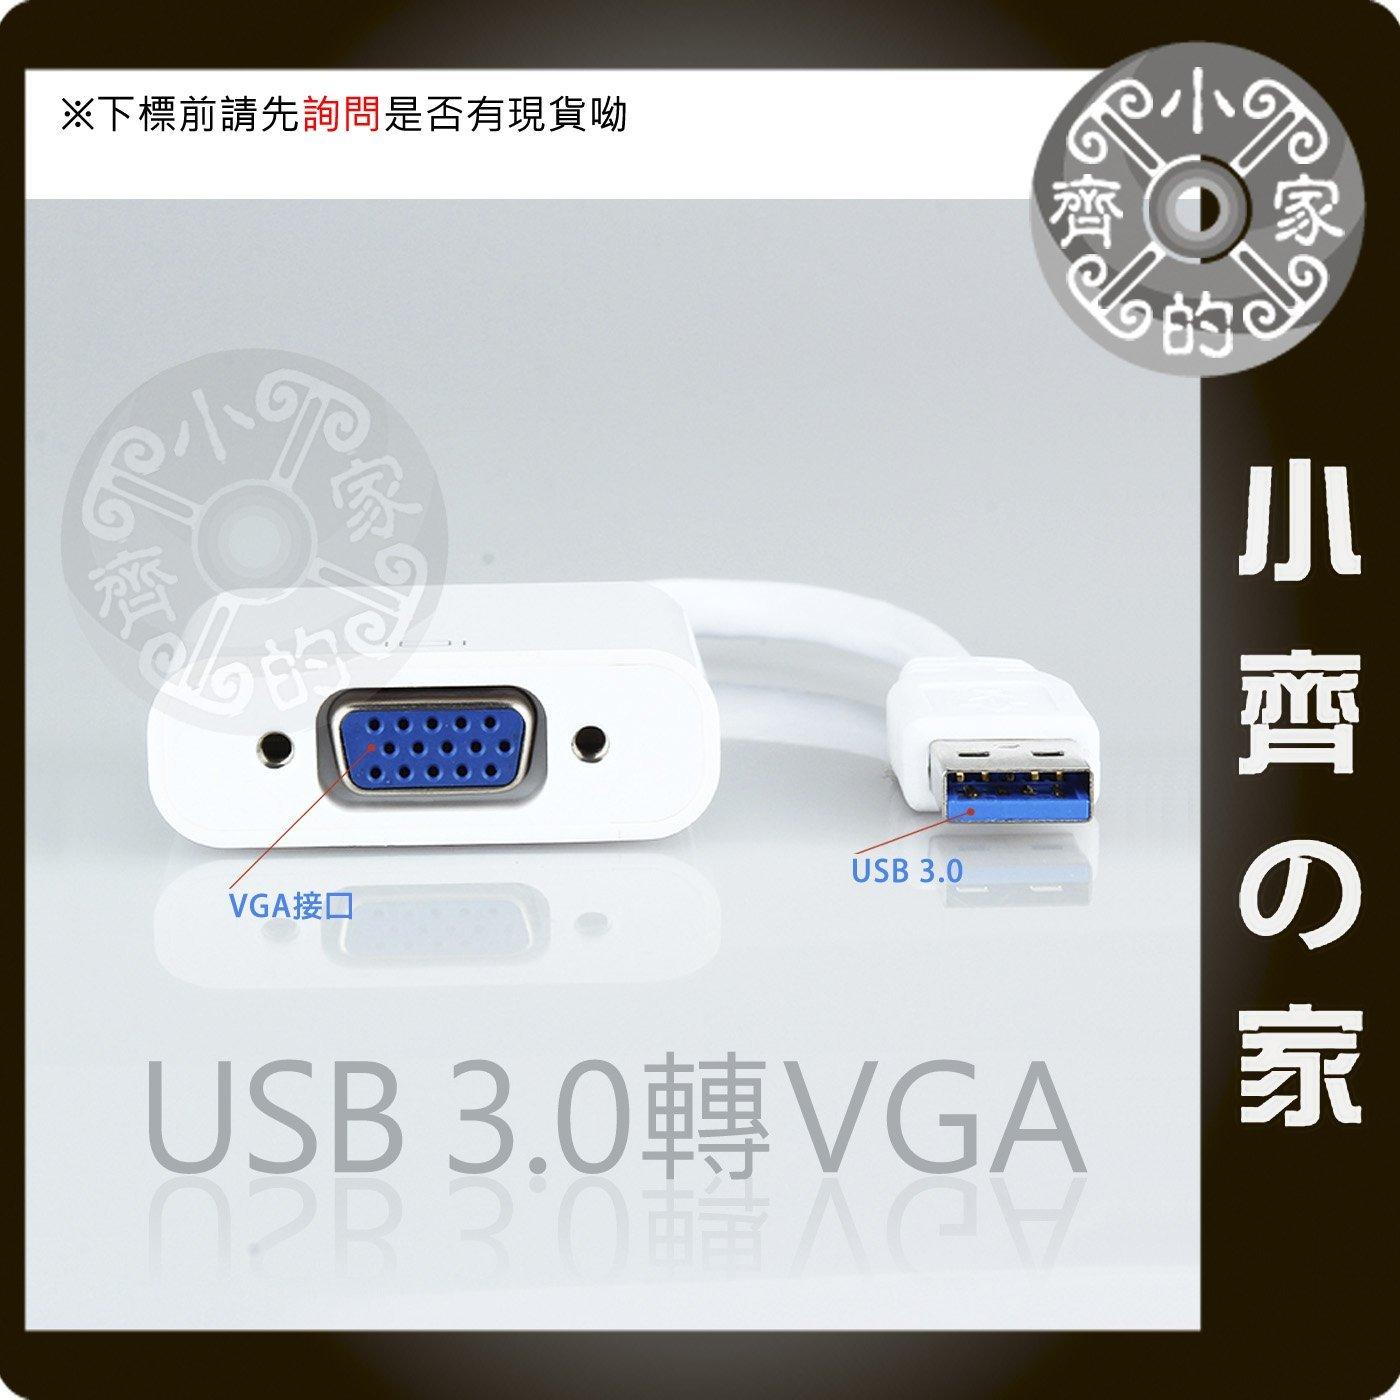 USB 3.0 2.0 轉 VGA 影像訊號線 USB TO VGA 外接顯示卡 螢幕視頻線 小齊的家